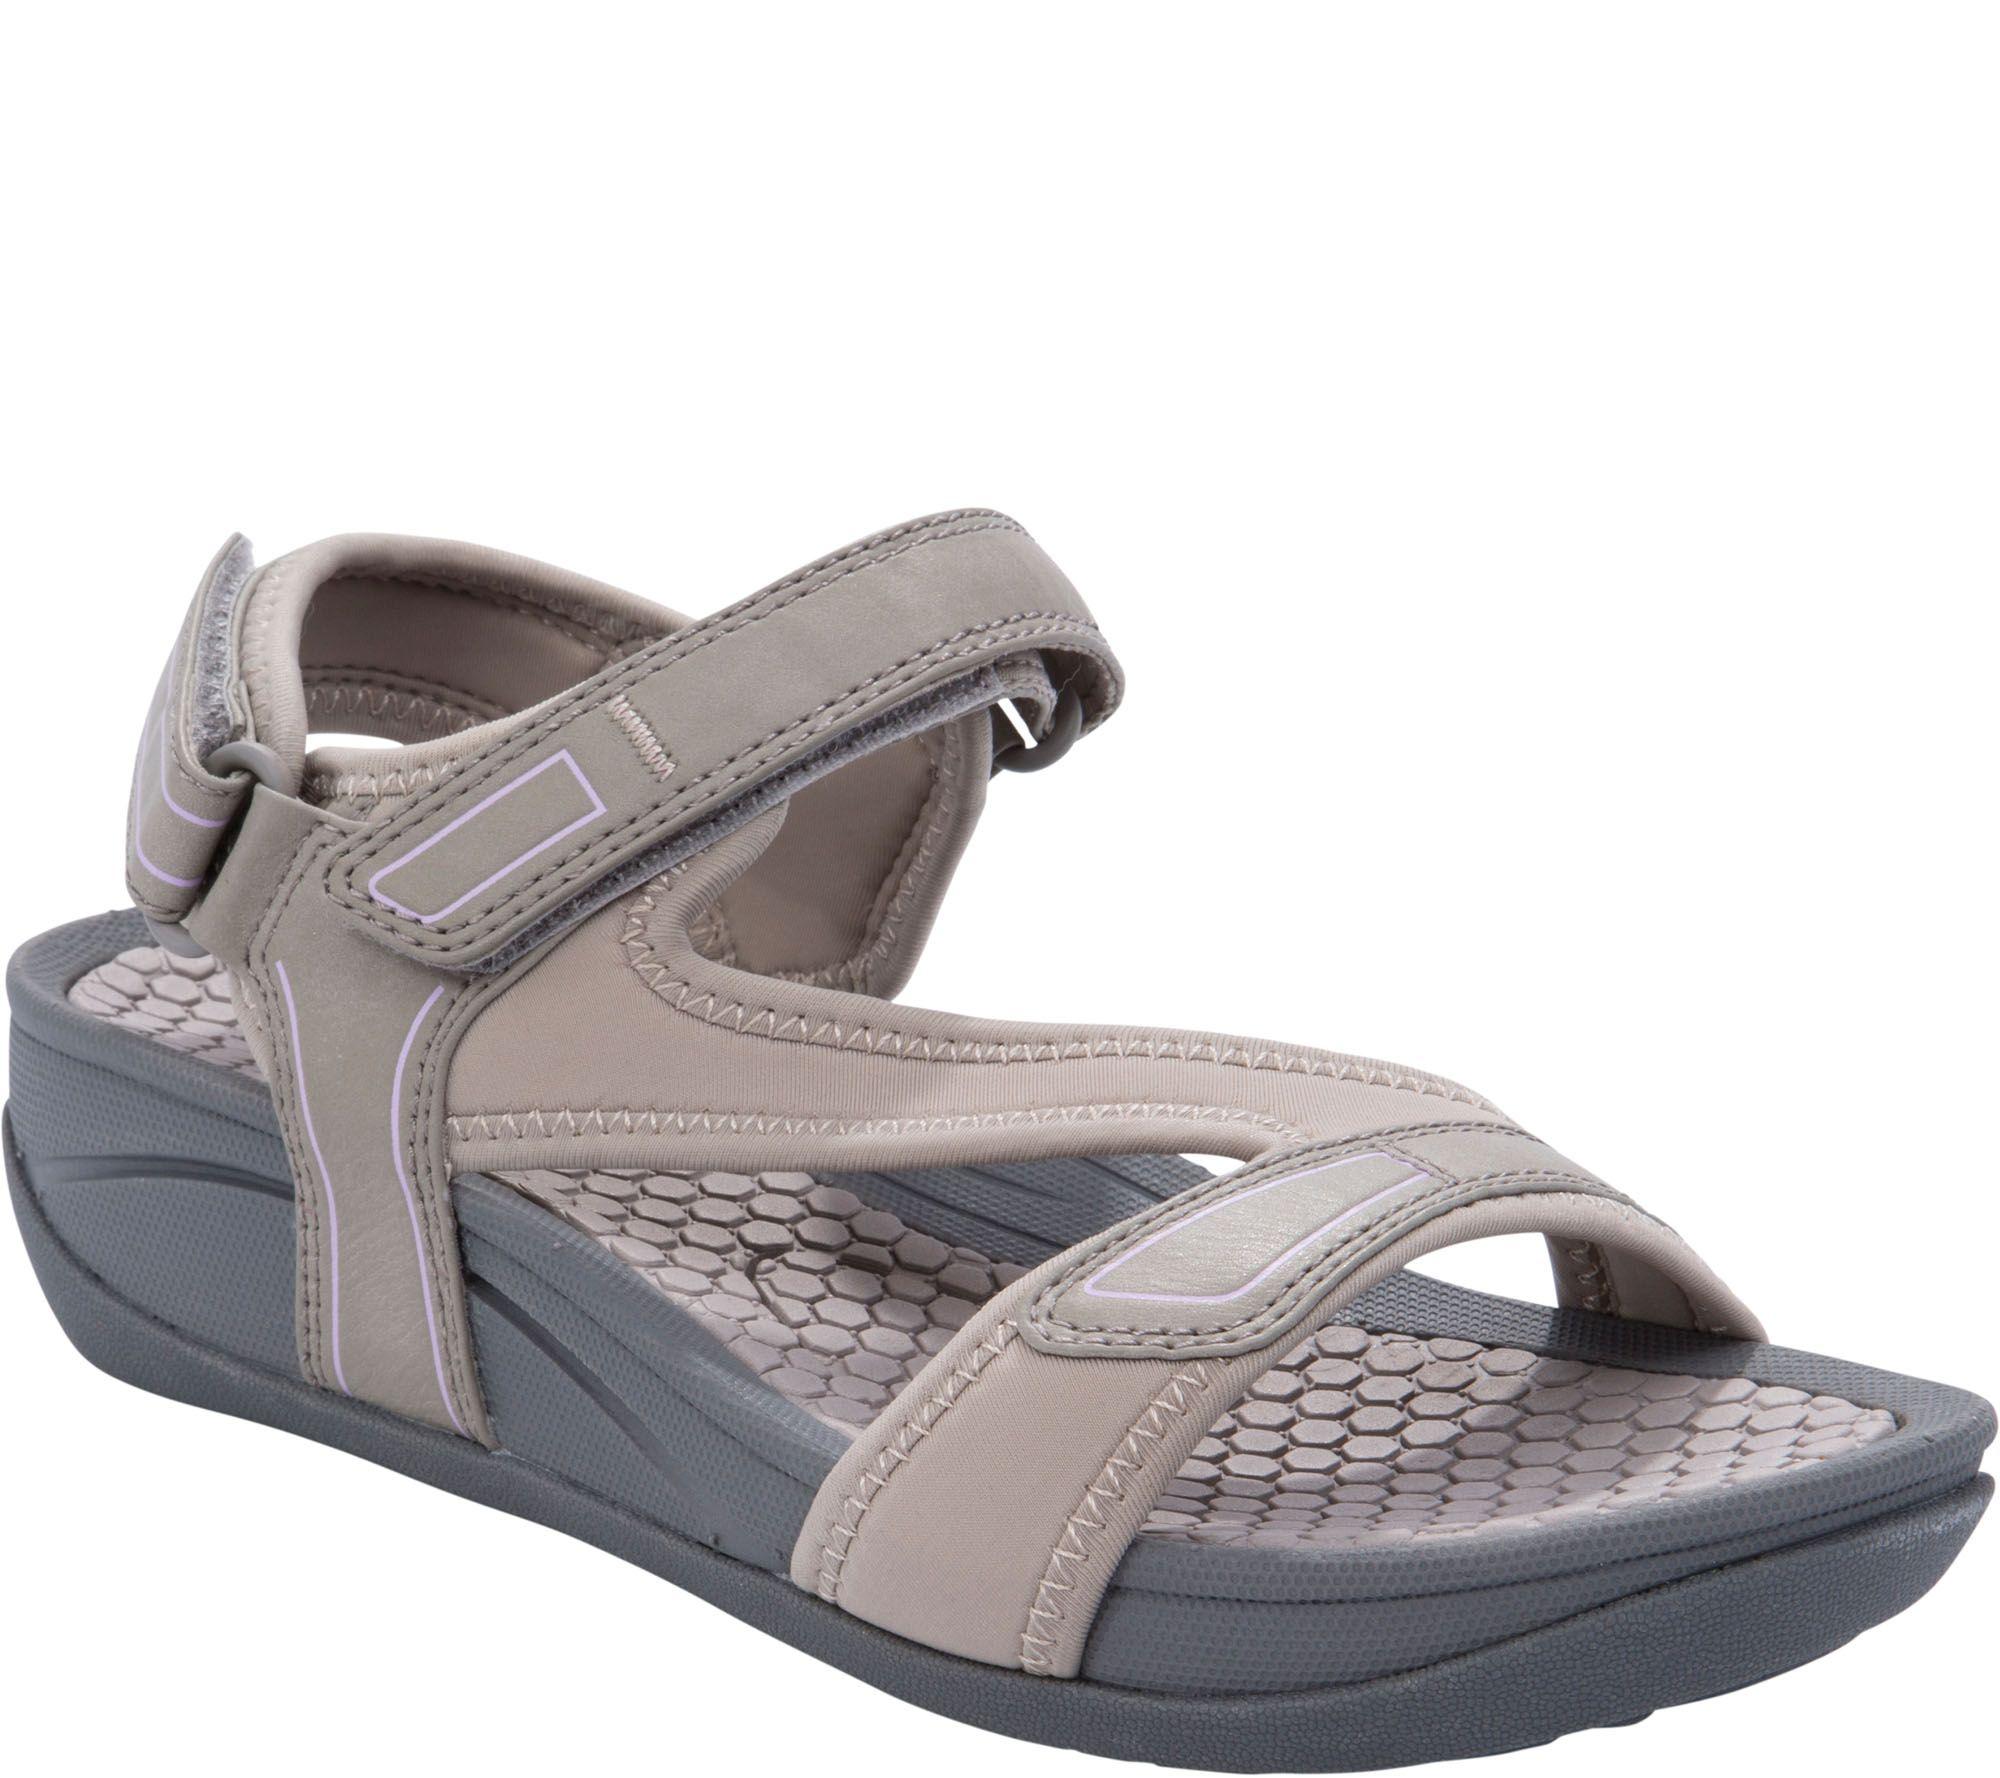 f3af2002667 Baretraps Strappy Sport Sandals - Donatella — QVC.com